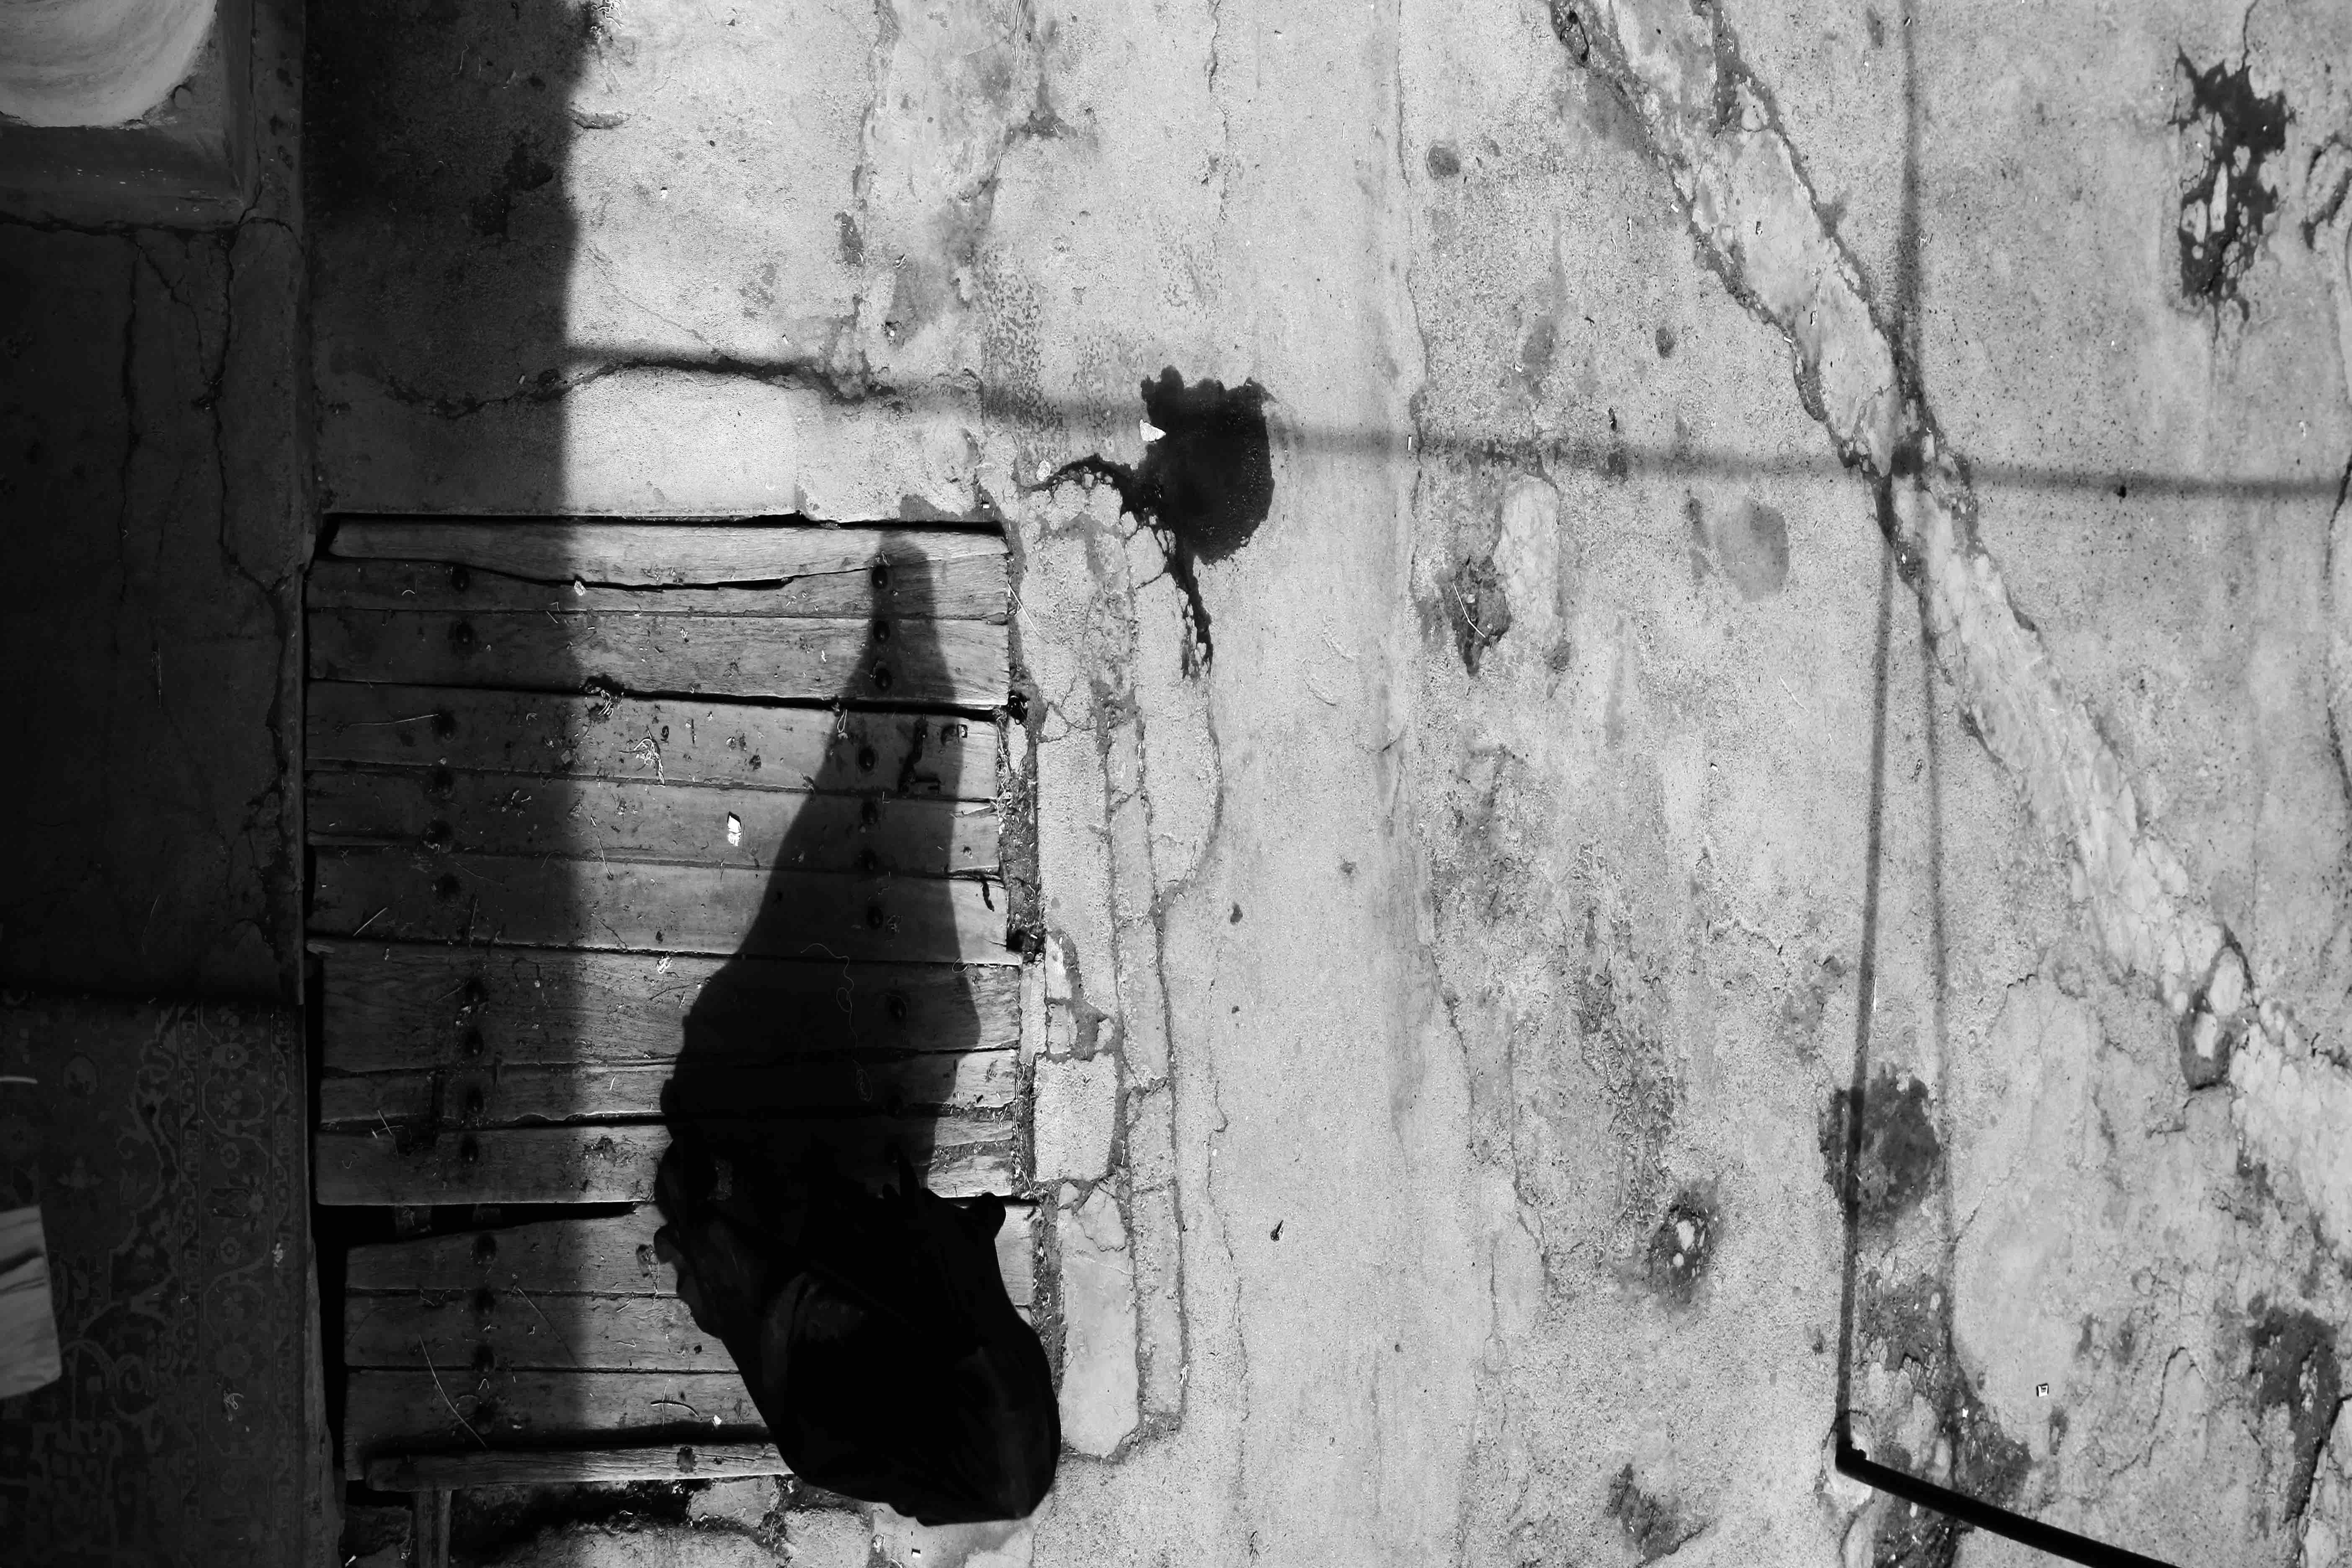 Untitled (9)_ The Life Of Shadows Series - Nehdaran_ Dana